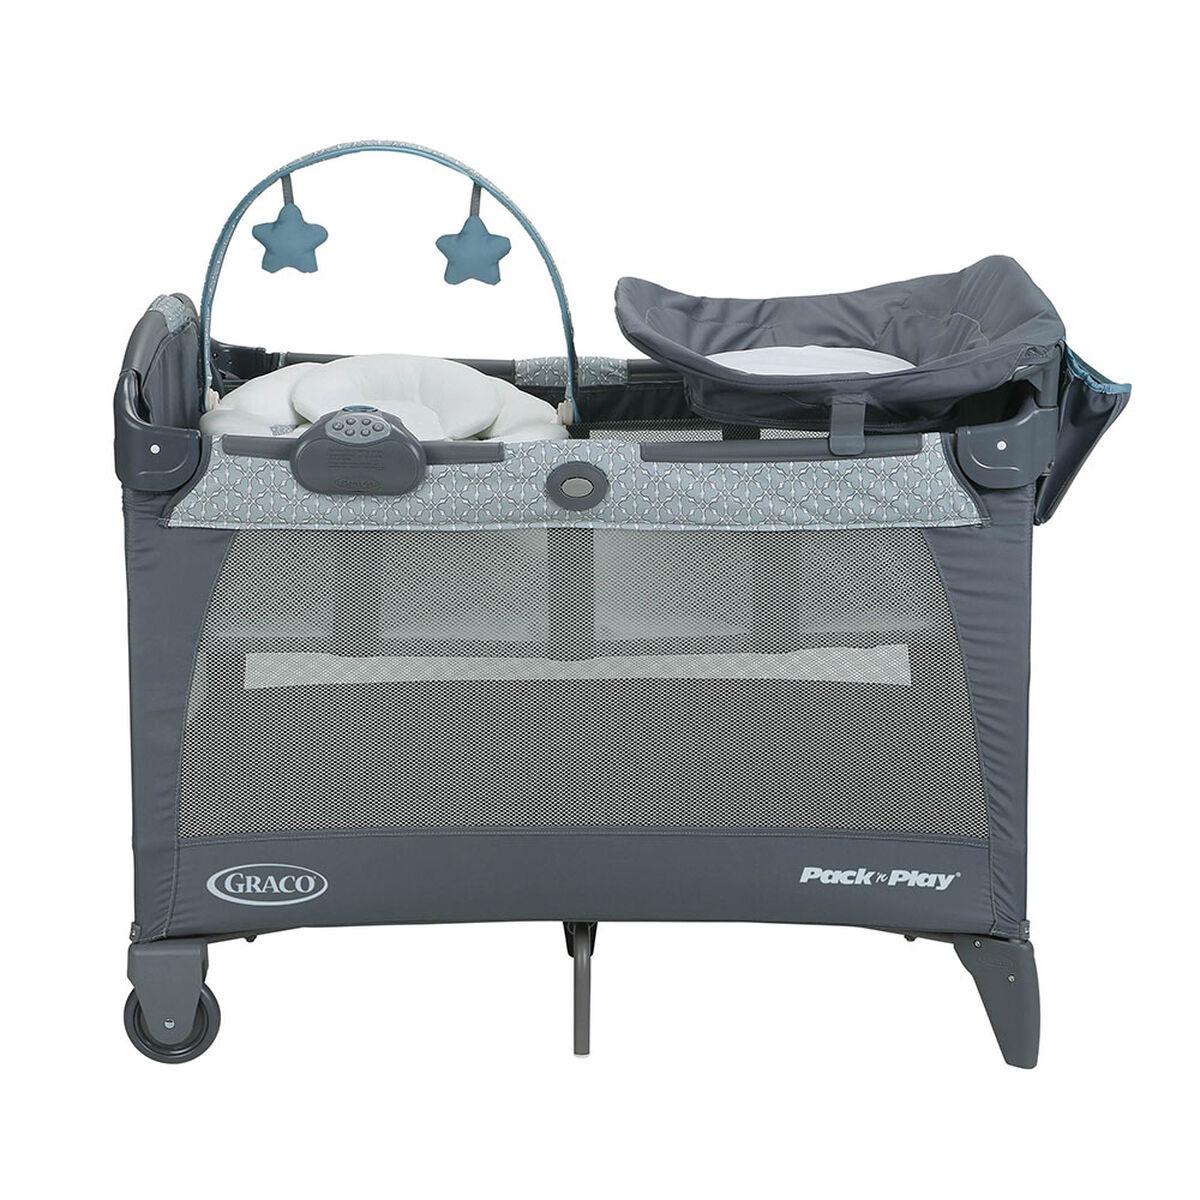 Cuna Corral Pack & Play Graco Napper LX 7737